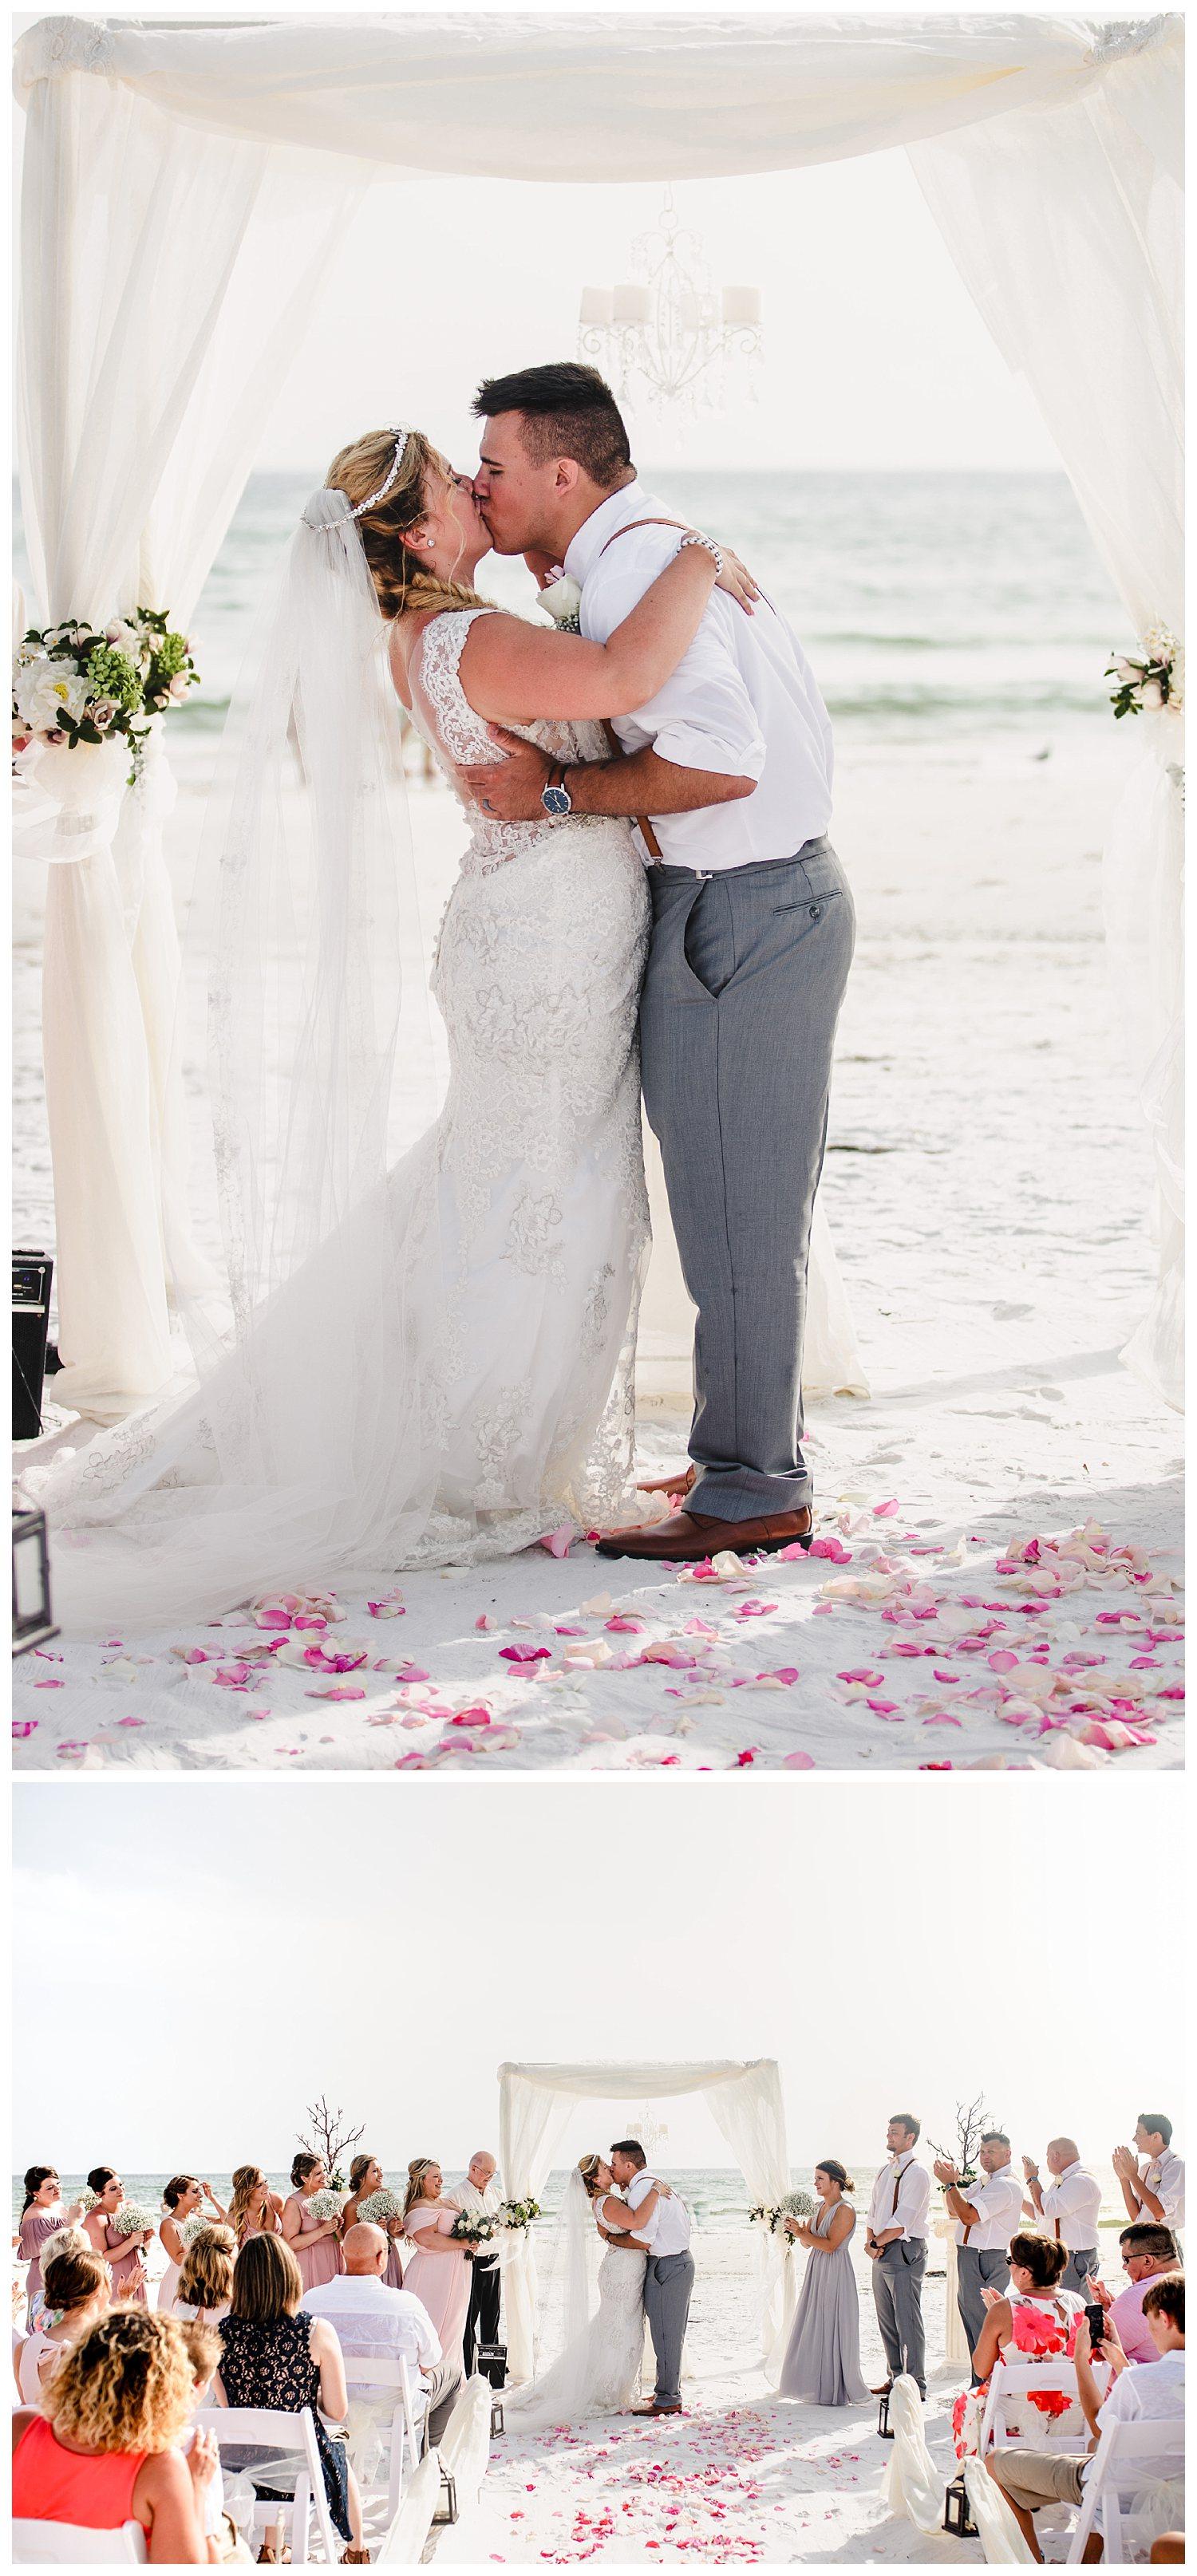 Kelsey_Diane_Photography_Destination_Wedding_Sarasota_Florida_Beach_Wedding_Alex_Austin_0652.jpg